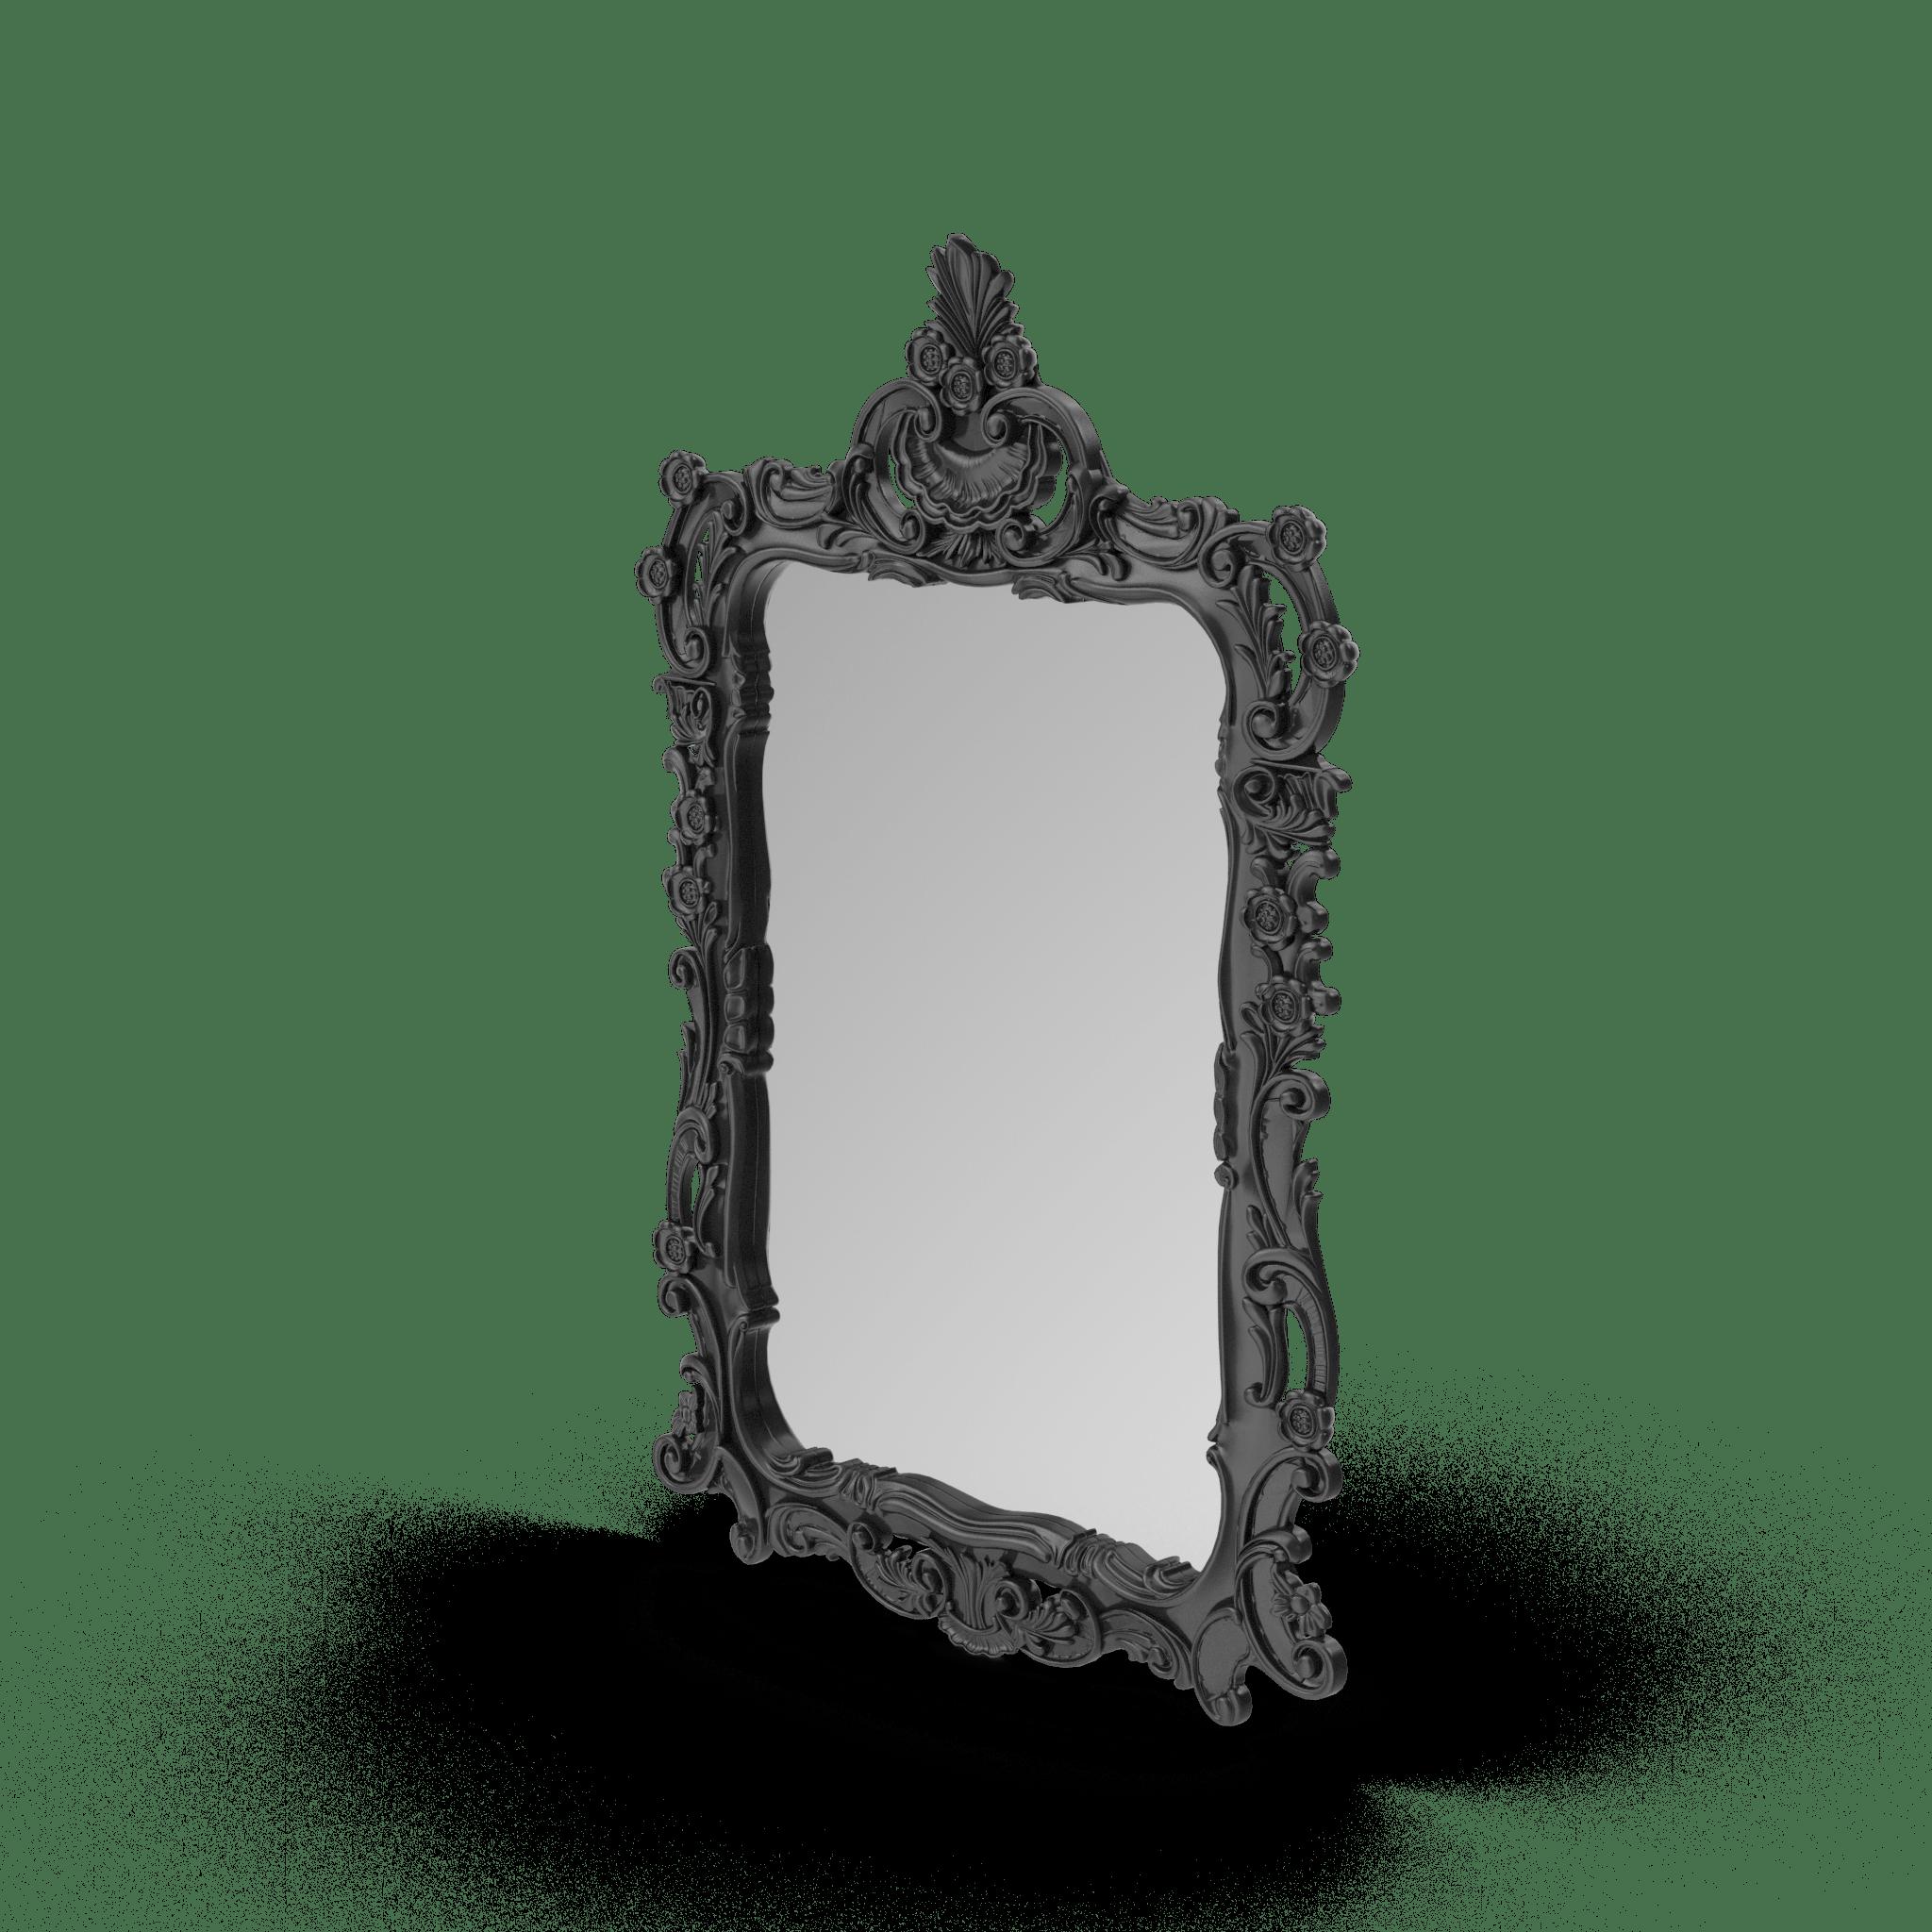 Black Wall Baroque Mirror.H03.2k-min